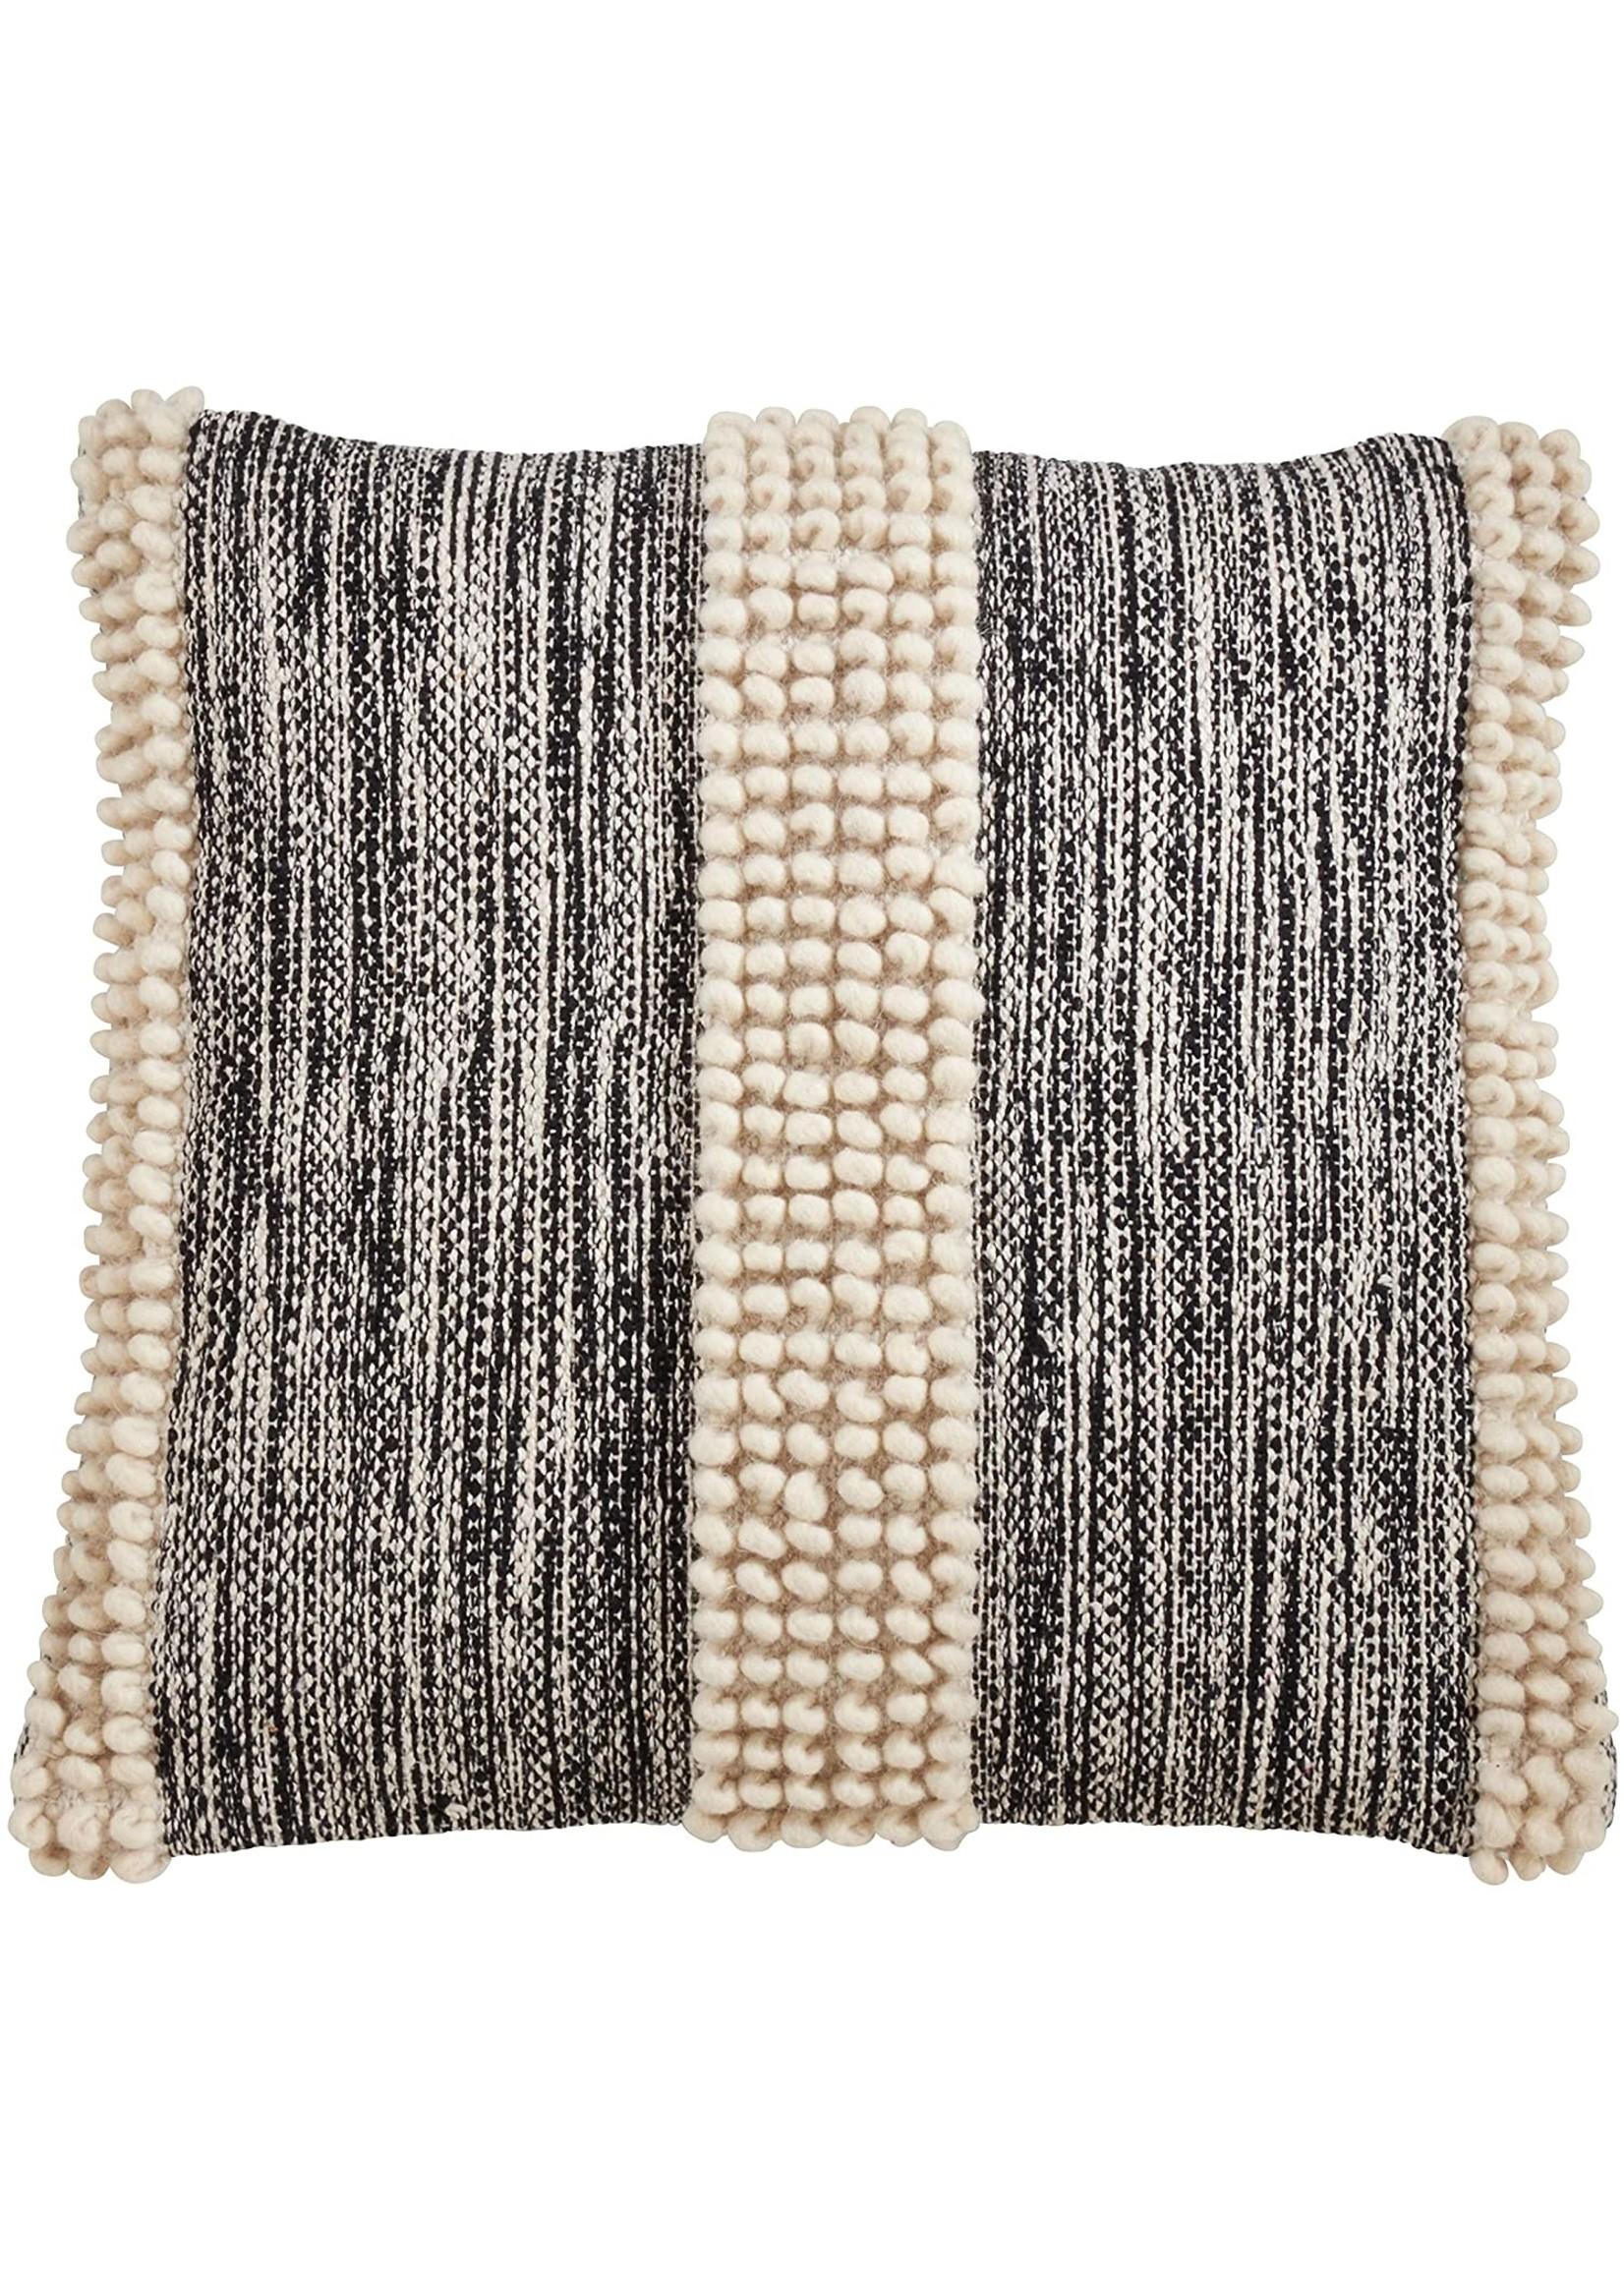 Saro Pom Pom Stripe Pillow - Black